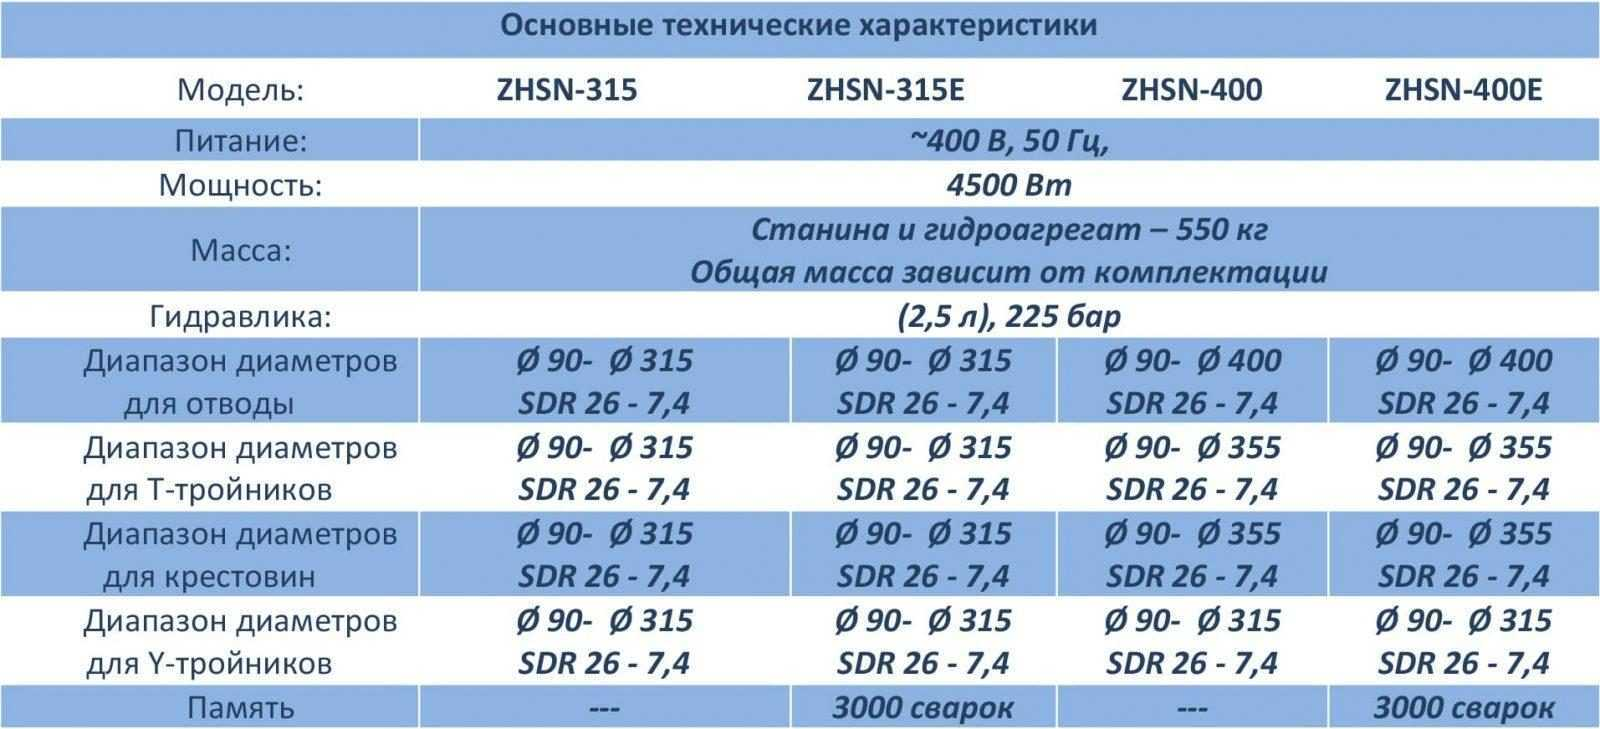 Характеристики ZHSN